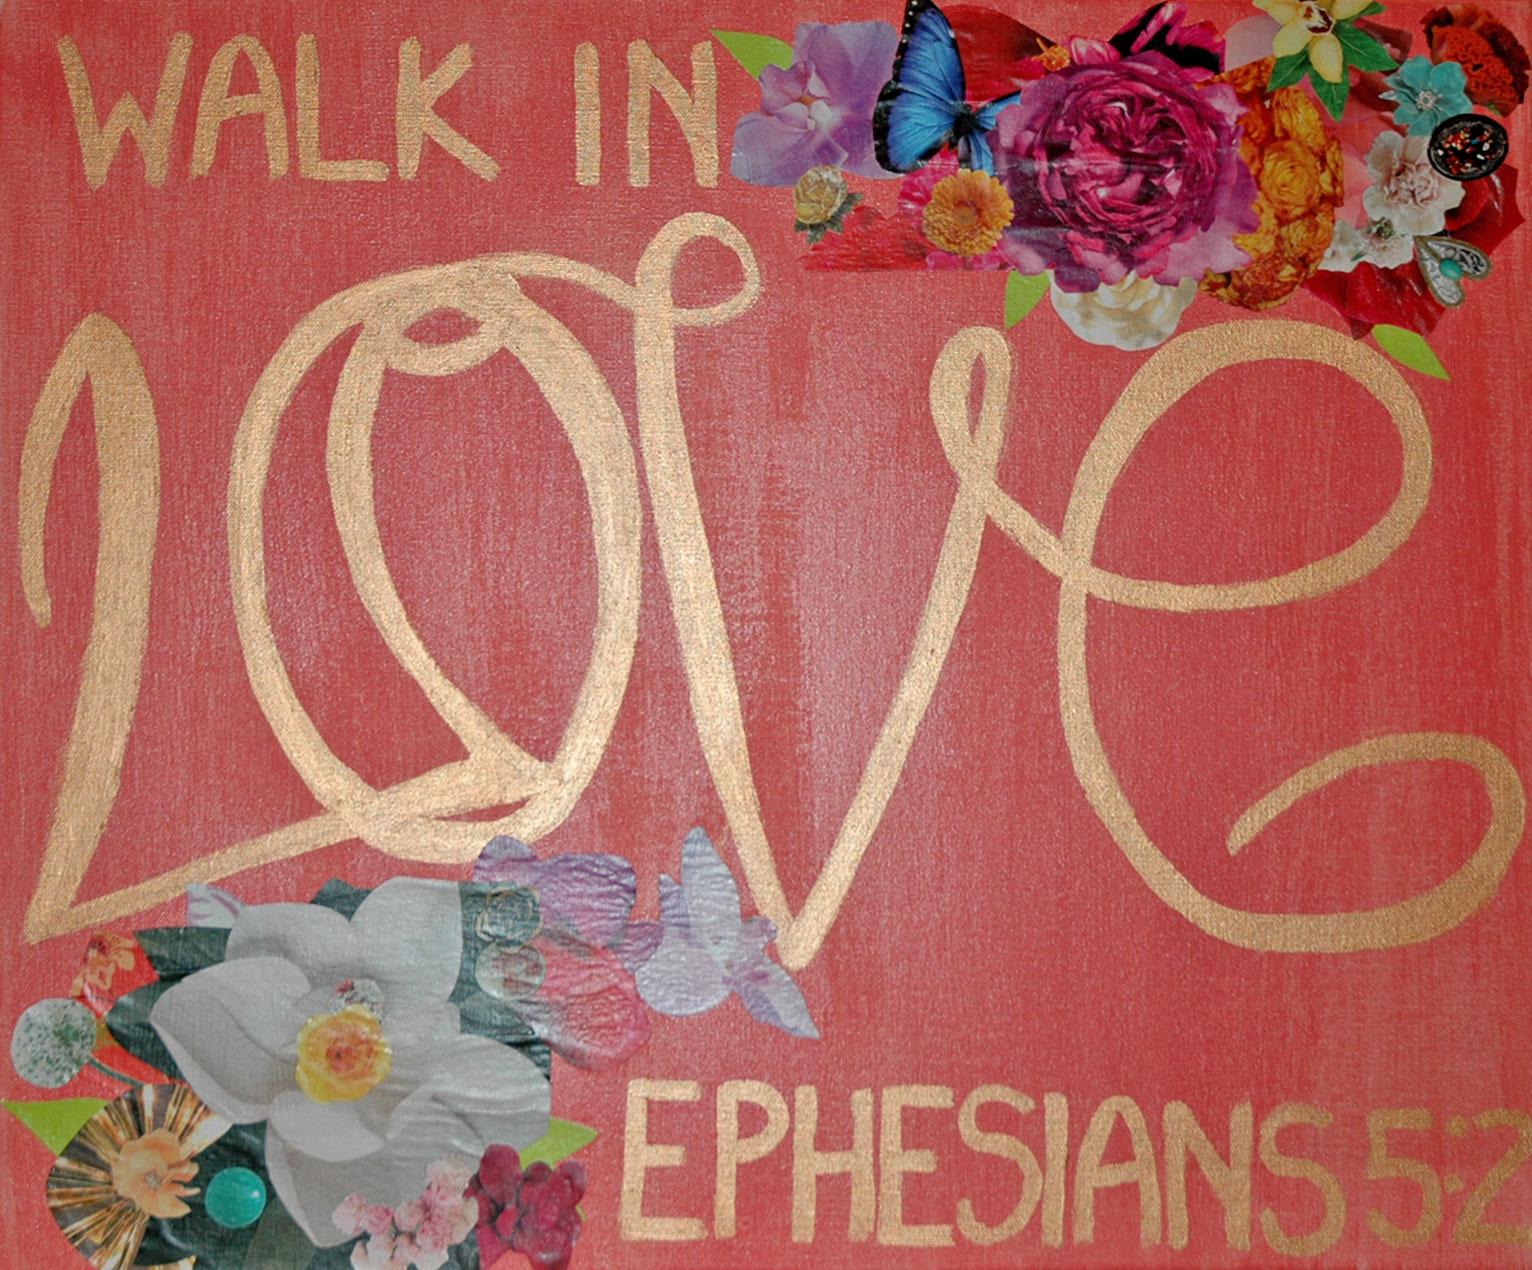 http://1.bp.blogspot.com/_MqkYNENG_DM/THGoF88i6lI/AAAAAAAABh4/CKFvNyFEtQk/s1600/1008_Walk_in_Love.jpg